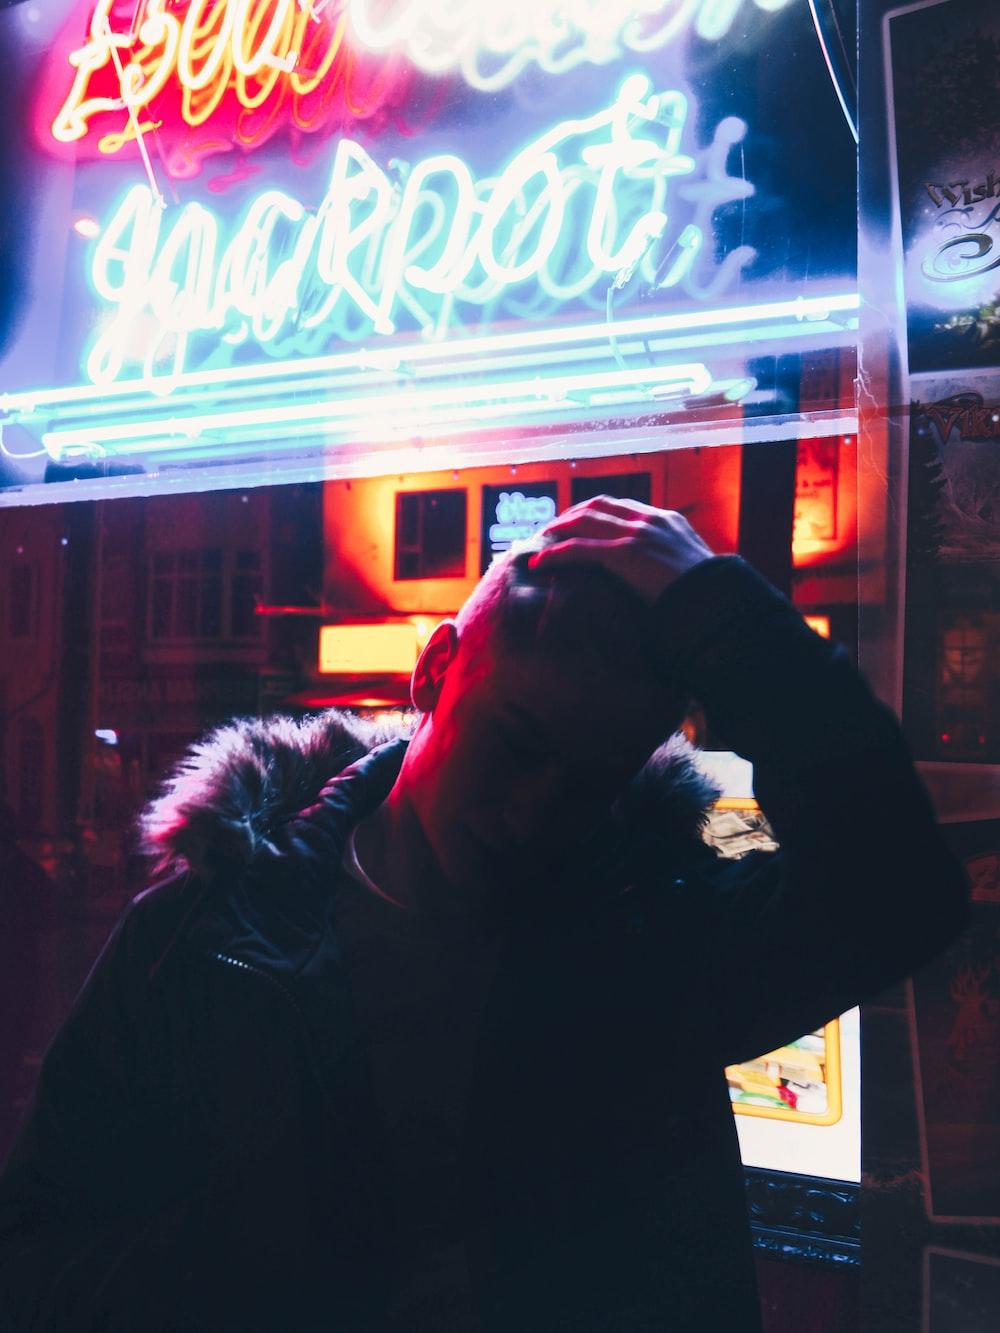 man standing near neon signs